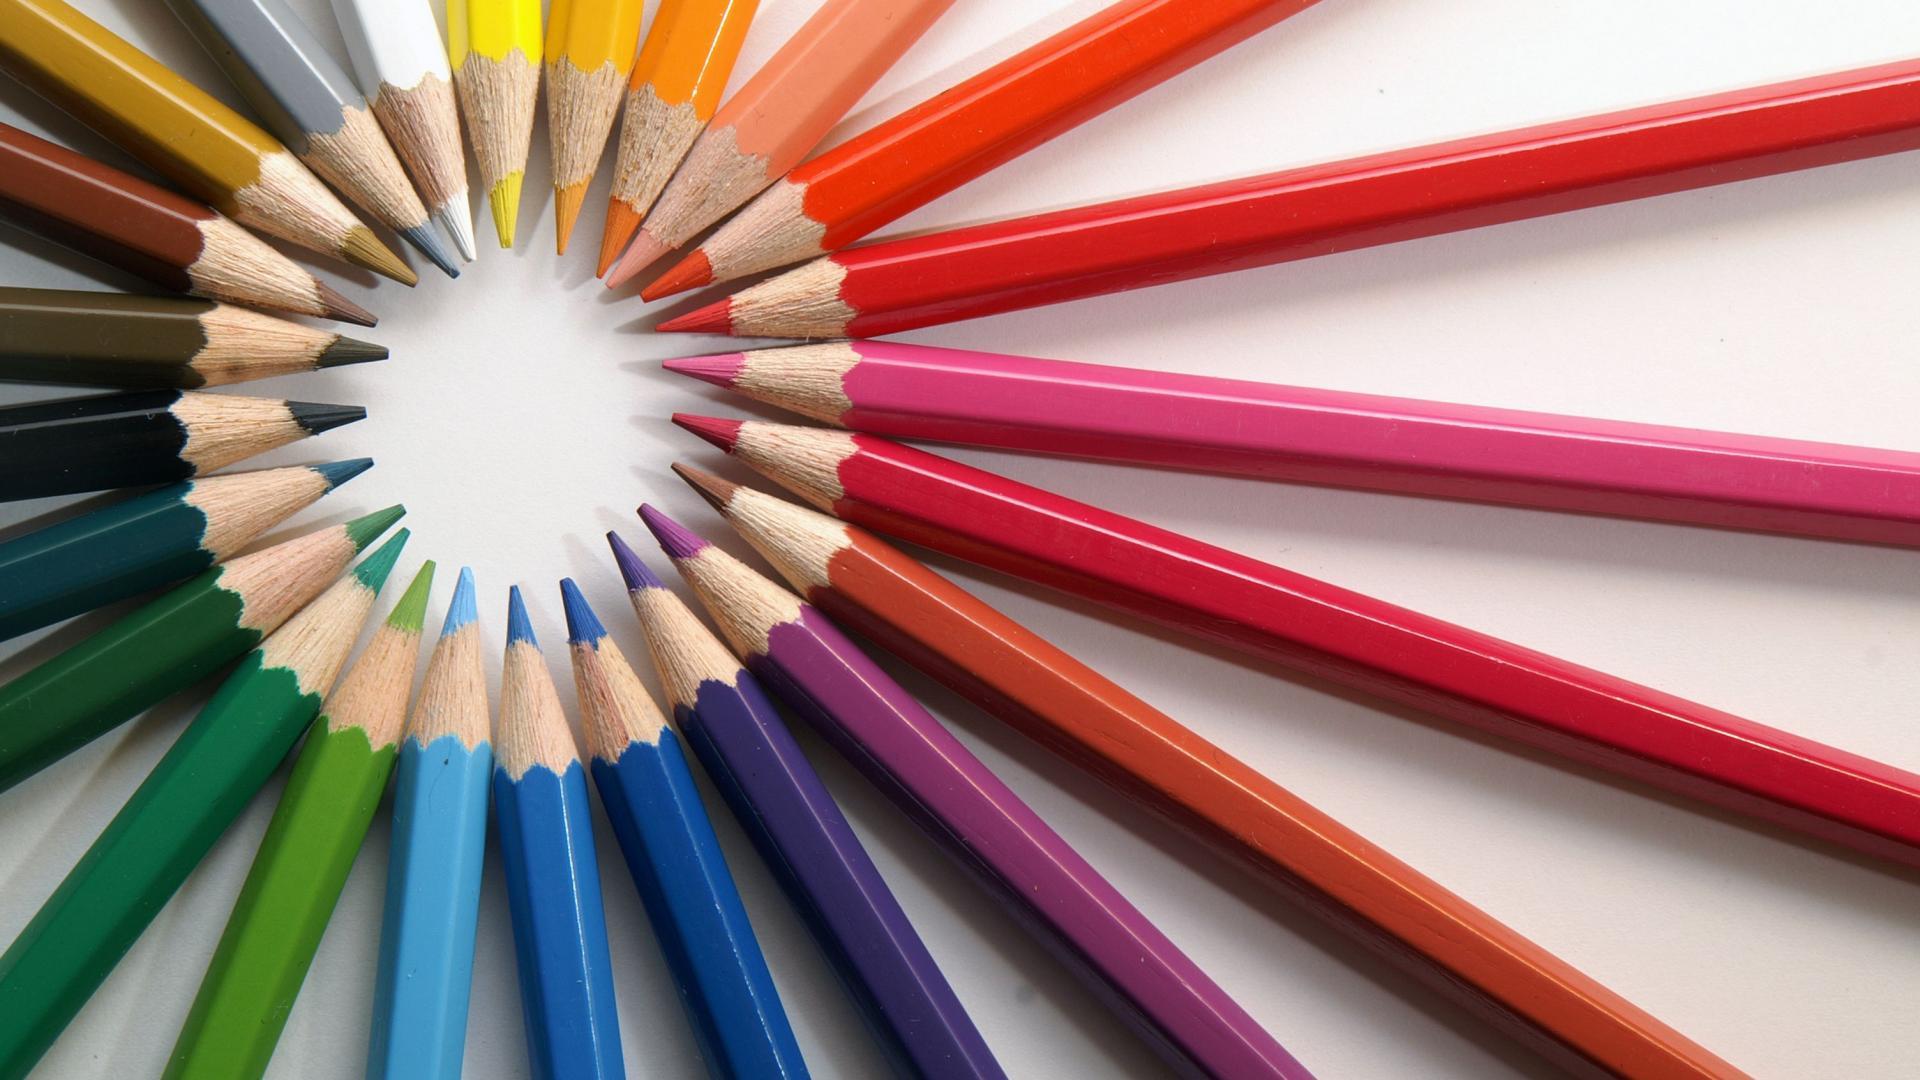 3d Painting Hd Wallpaper Desktop Color Hd Wallpapers Pixelstalk Net